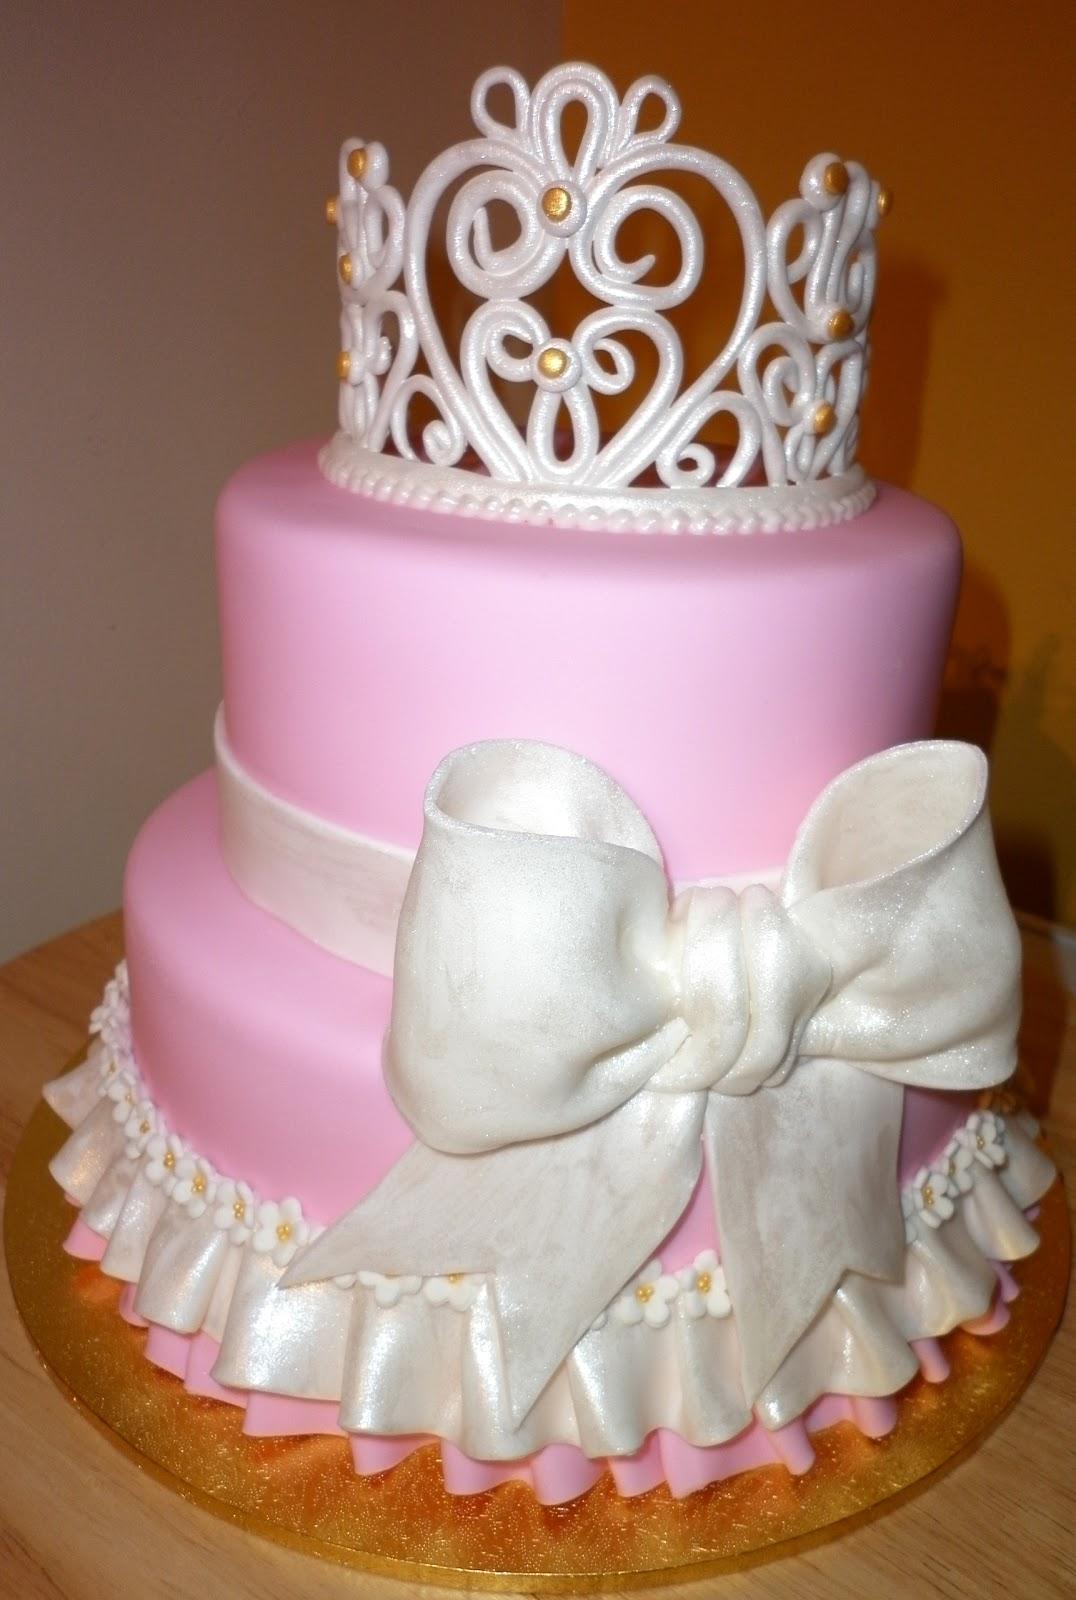 Tiara Crown Cake Ideas And Designs